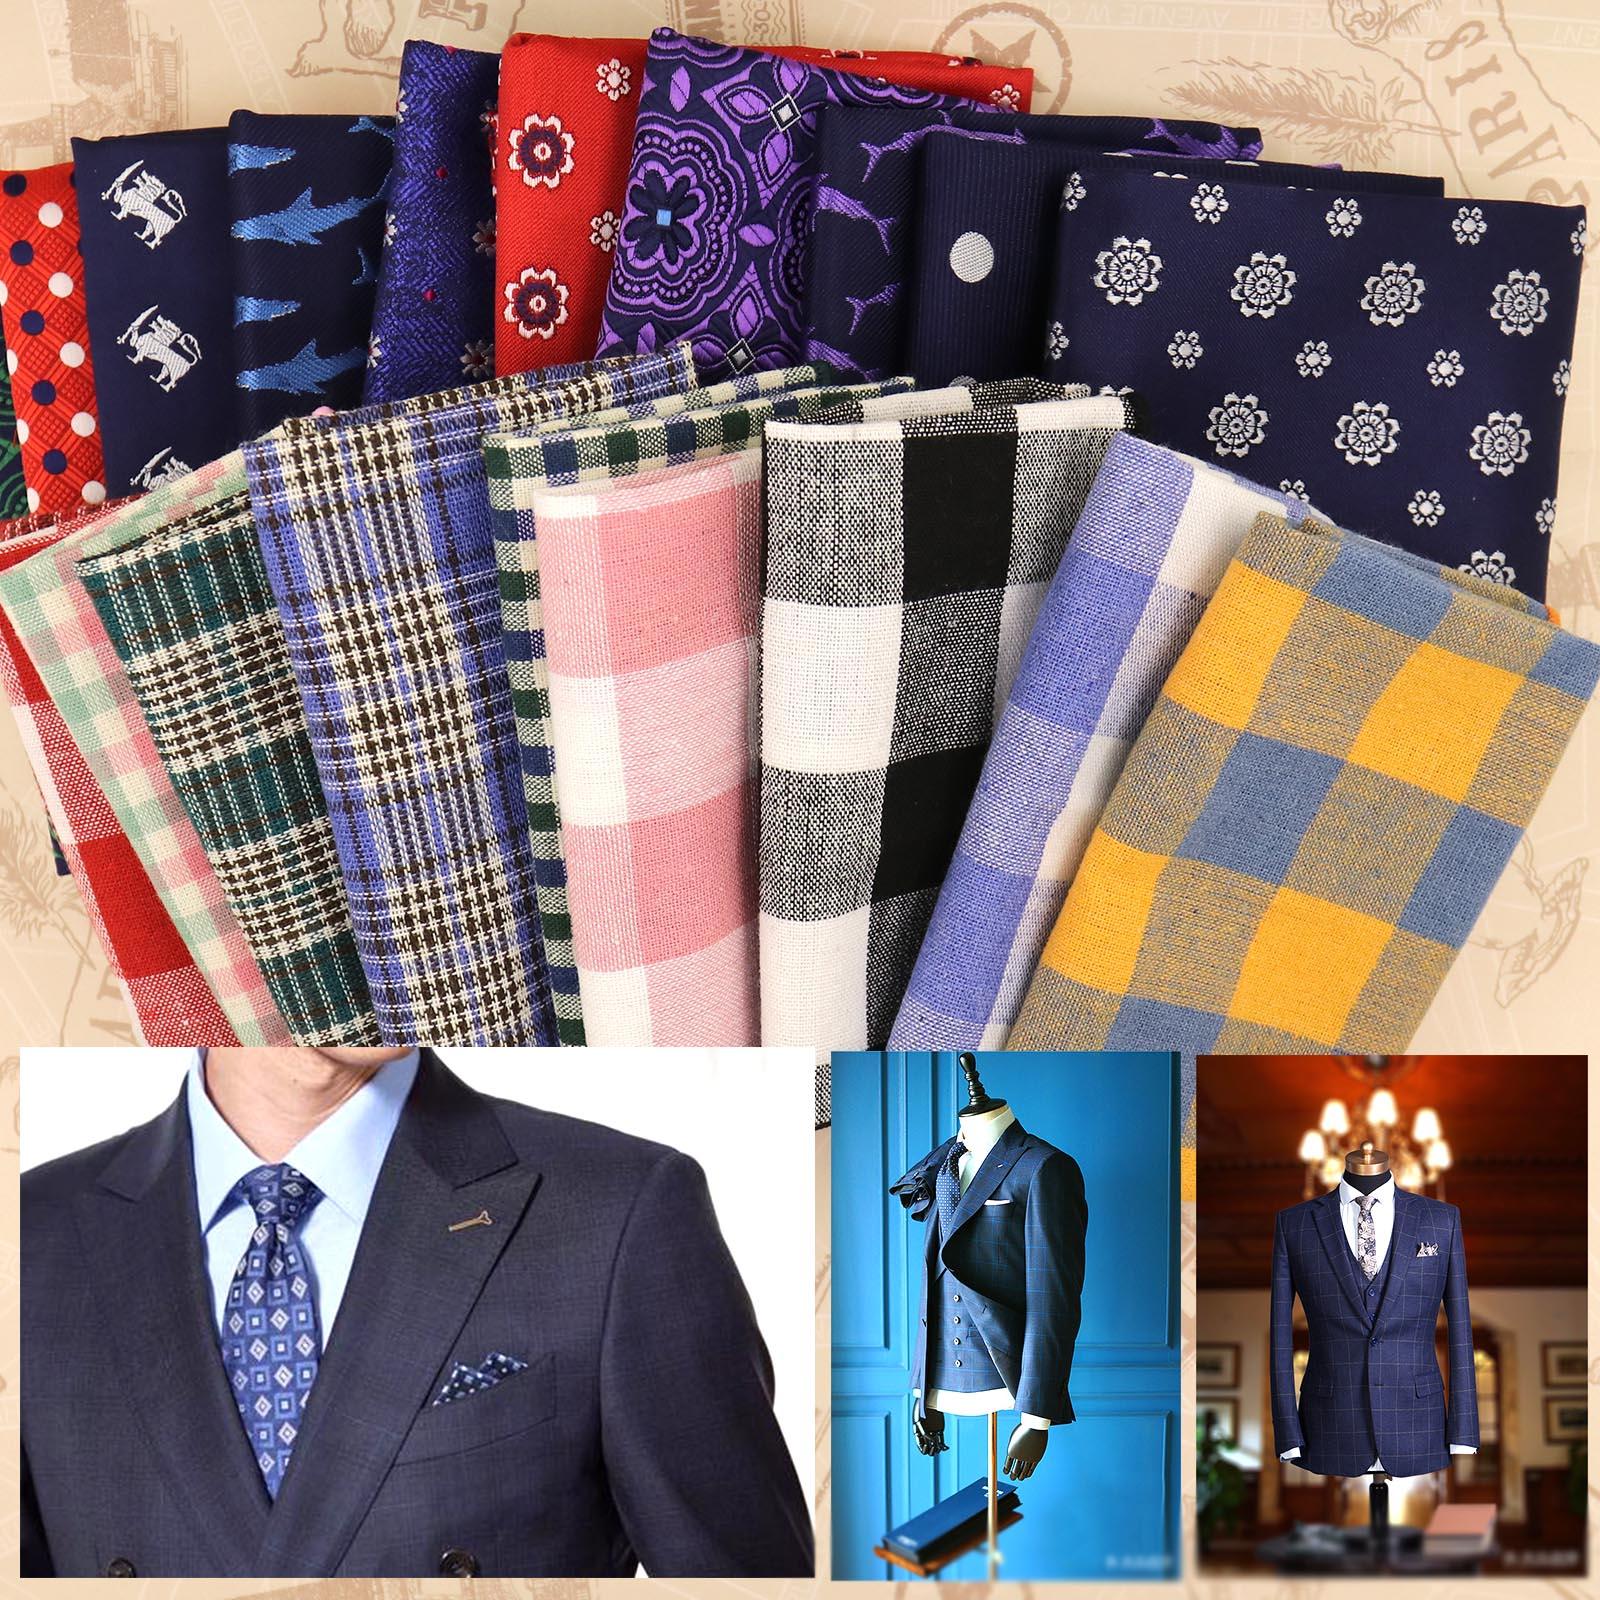 26 Pieces Mens Assorted Plain Colors Pocket Square Handkerchief Satin Polyester